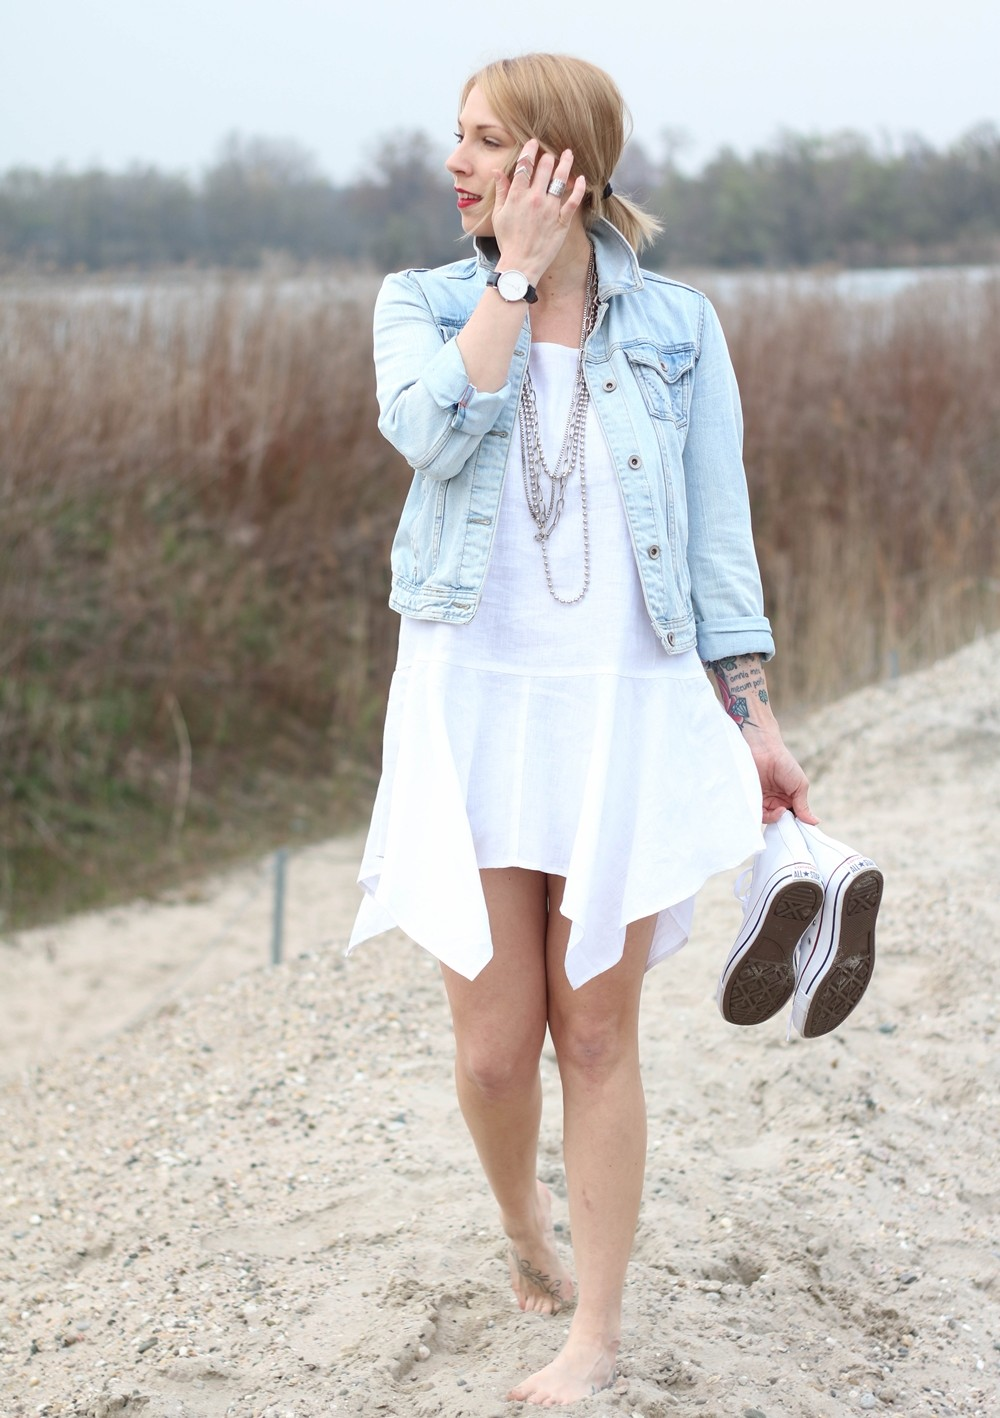 Fashionblogger Karlsruhe Outfit Strand weisses Kleid Jeansjacke Lederchucks (7)